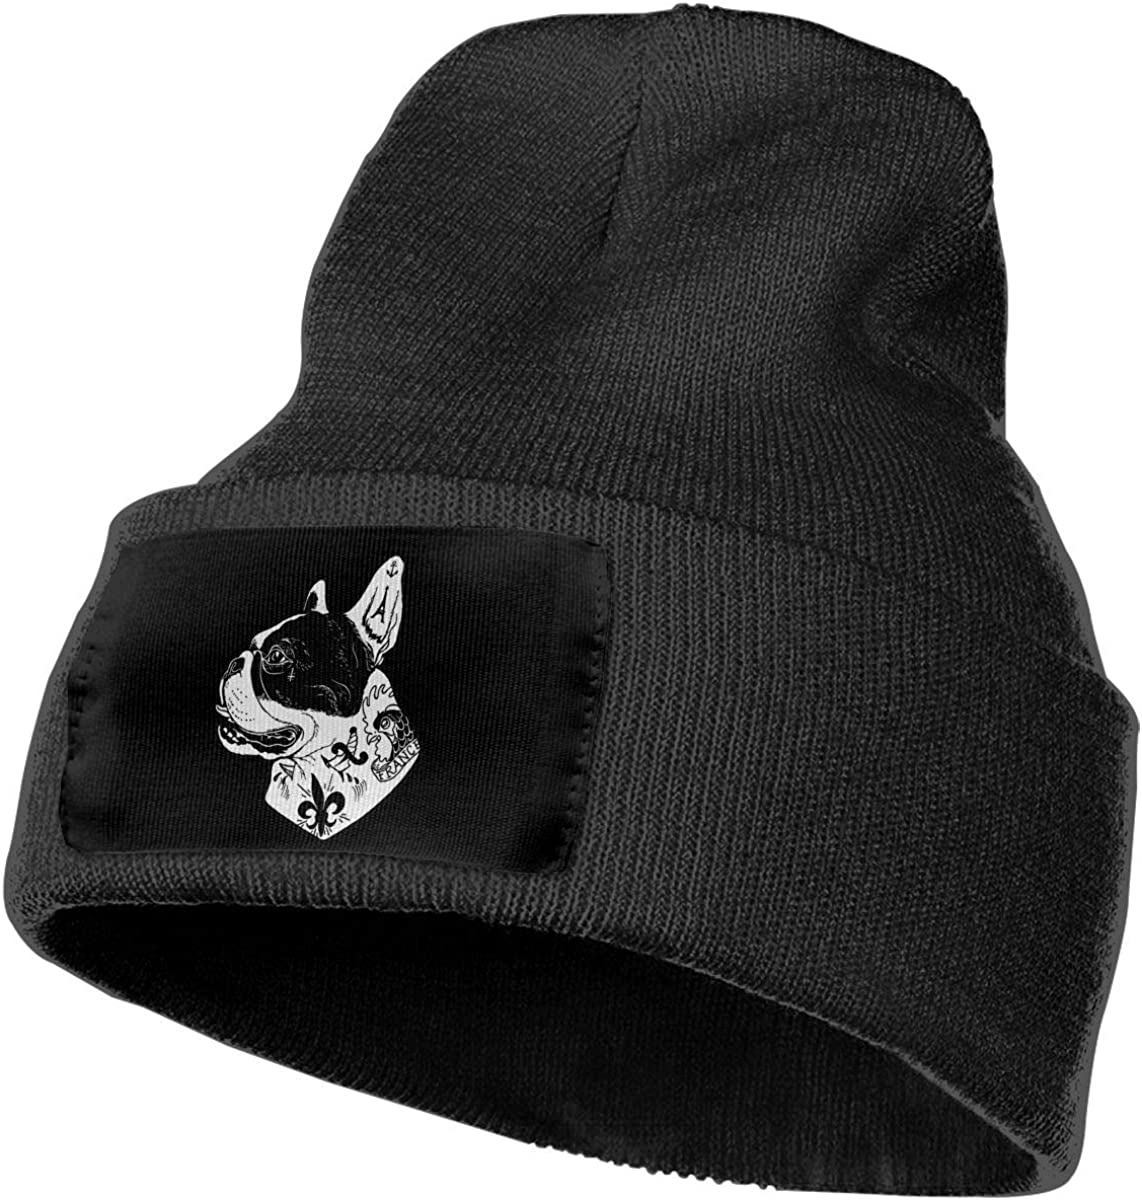 Unisex Stylish Slouch Beanie Hats Black Resist Logo Top Level Beanie Men Women